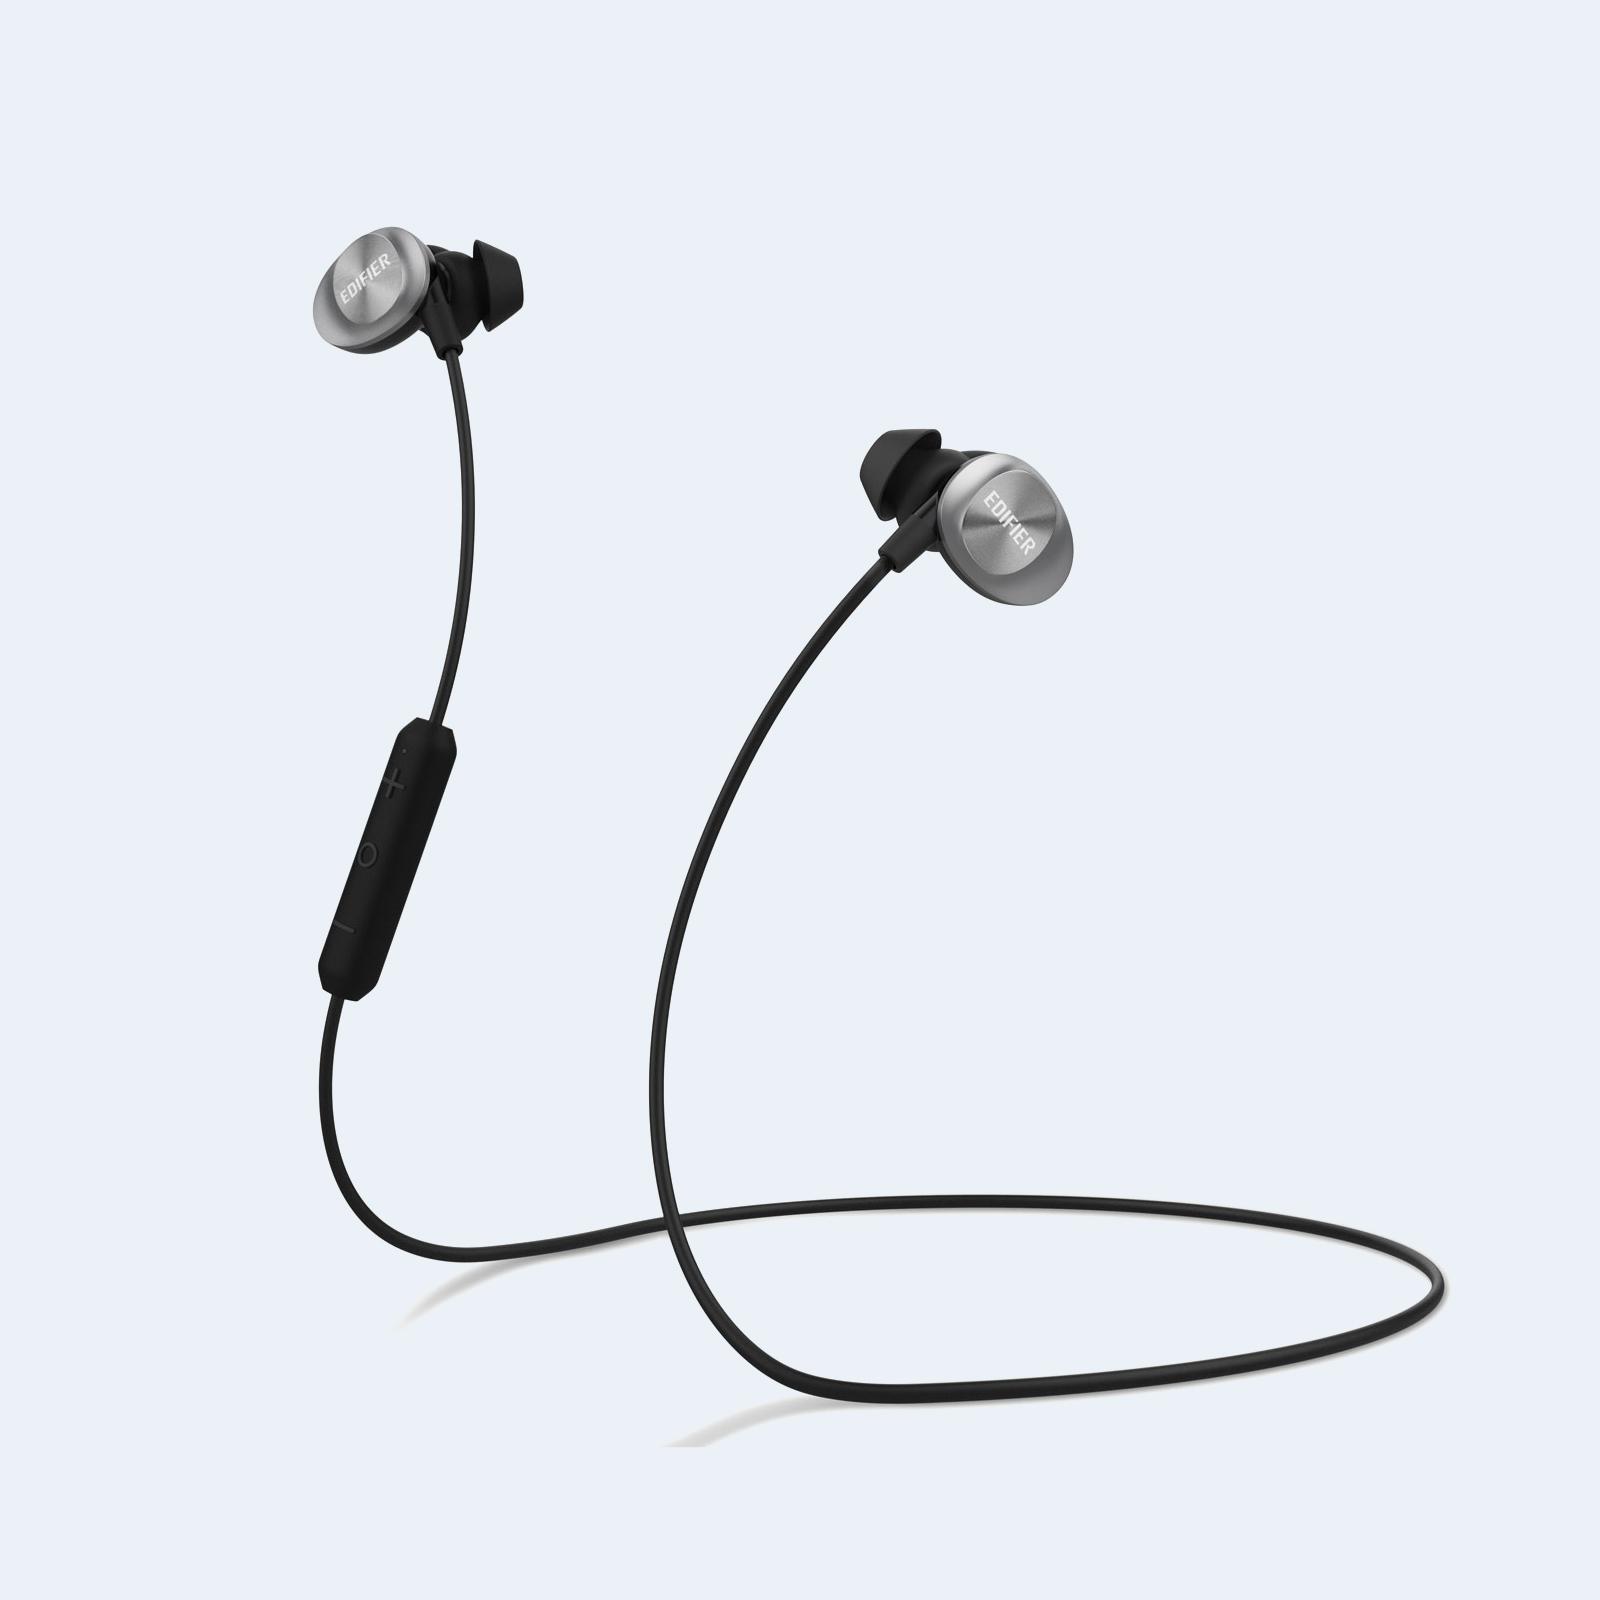 W285bt Sweat Proof Ipx4 Bluetooth Wireless Headphone